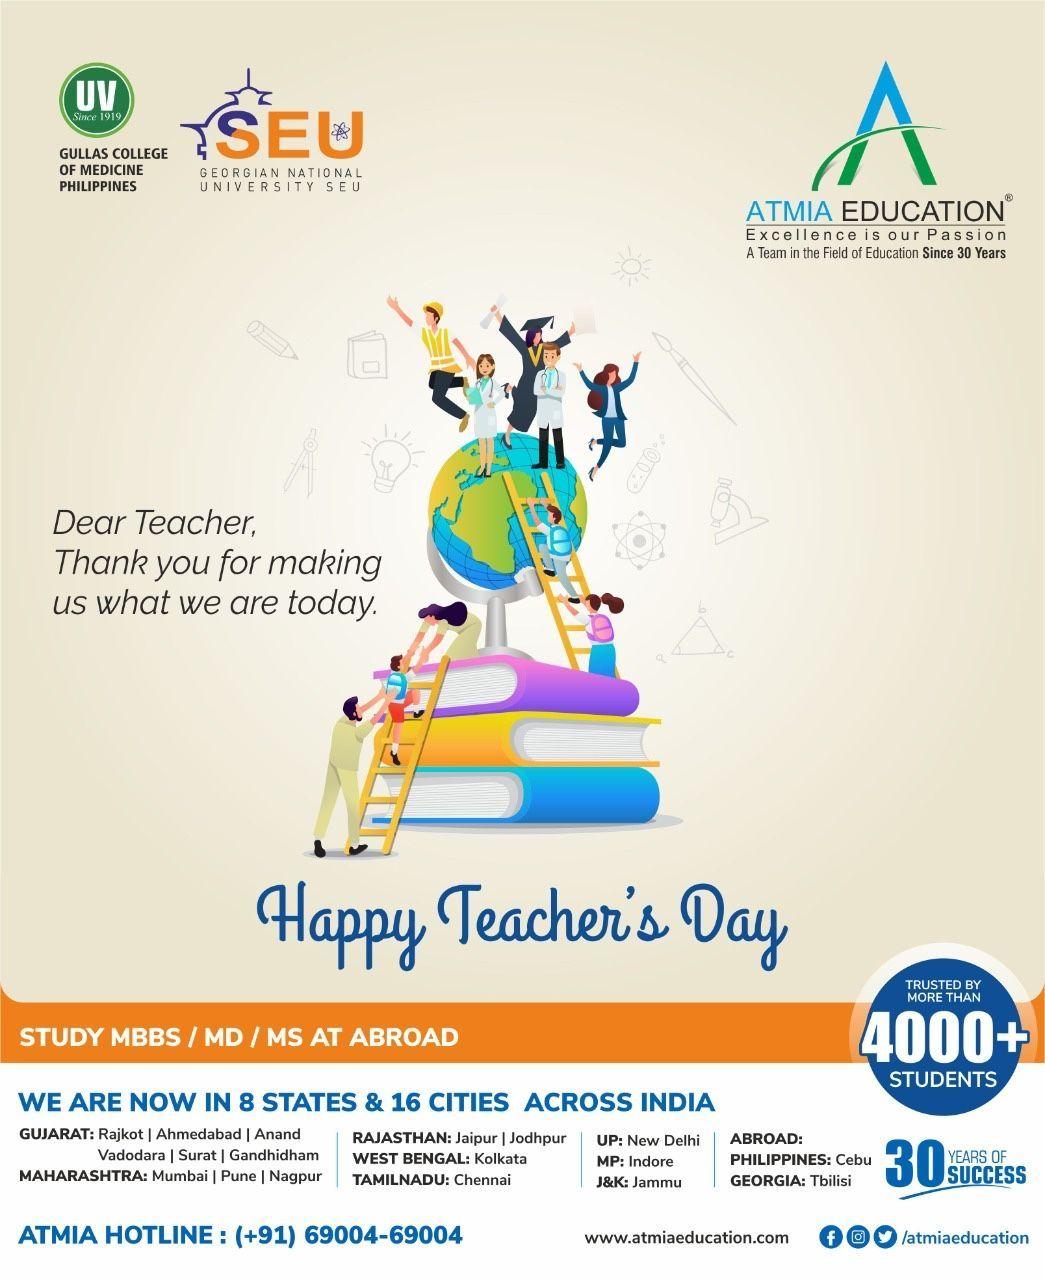 Happy Teachers Day 5th August Teachersday2020 Happyteachersday Mbbsabroad Philippines Studyabroad Mbbs In 2020 Happy Teachers Day Teachers Day Medical College